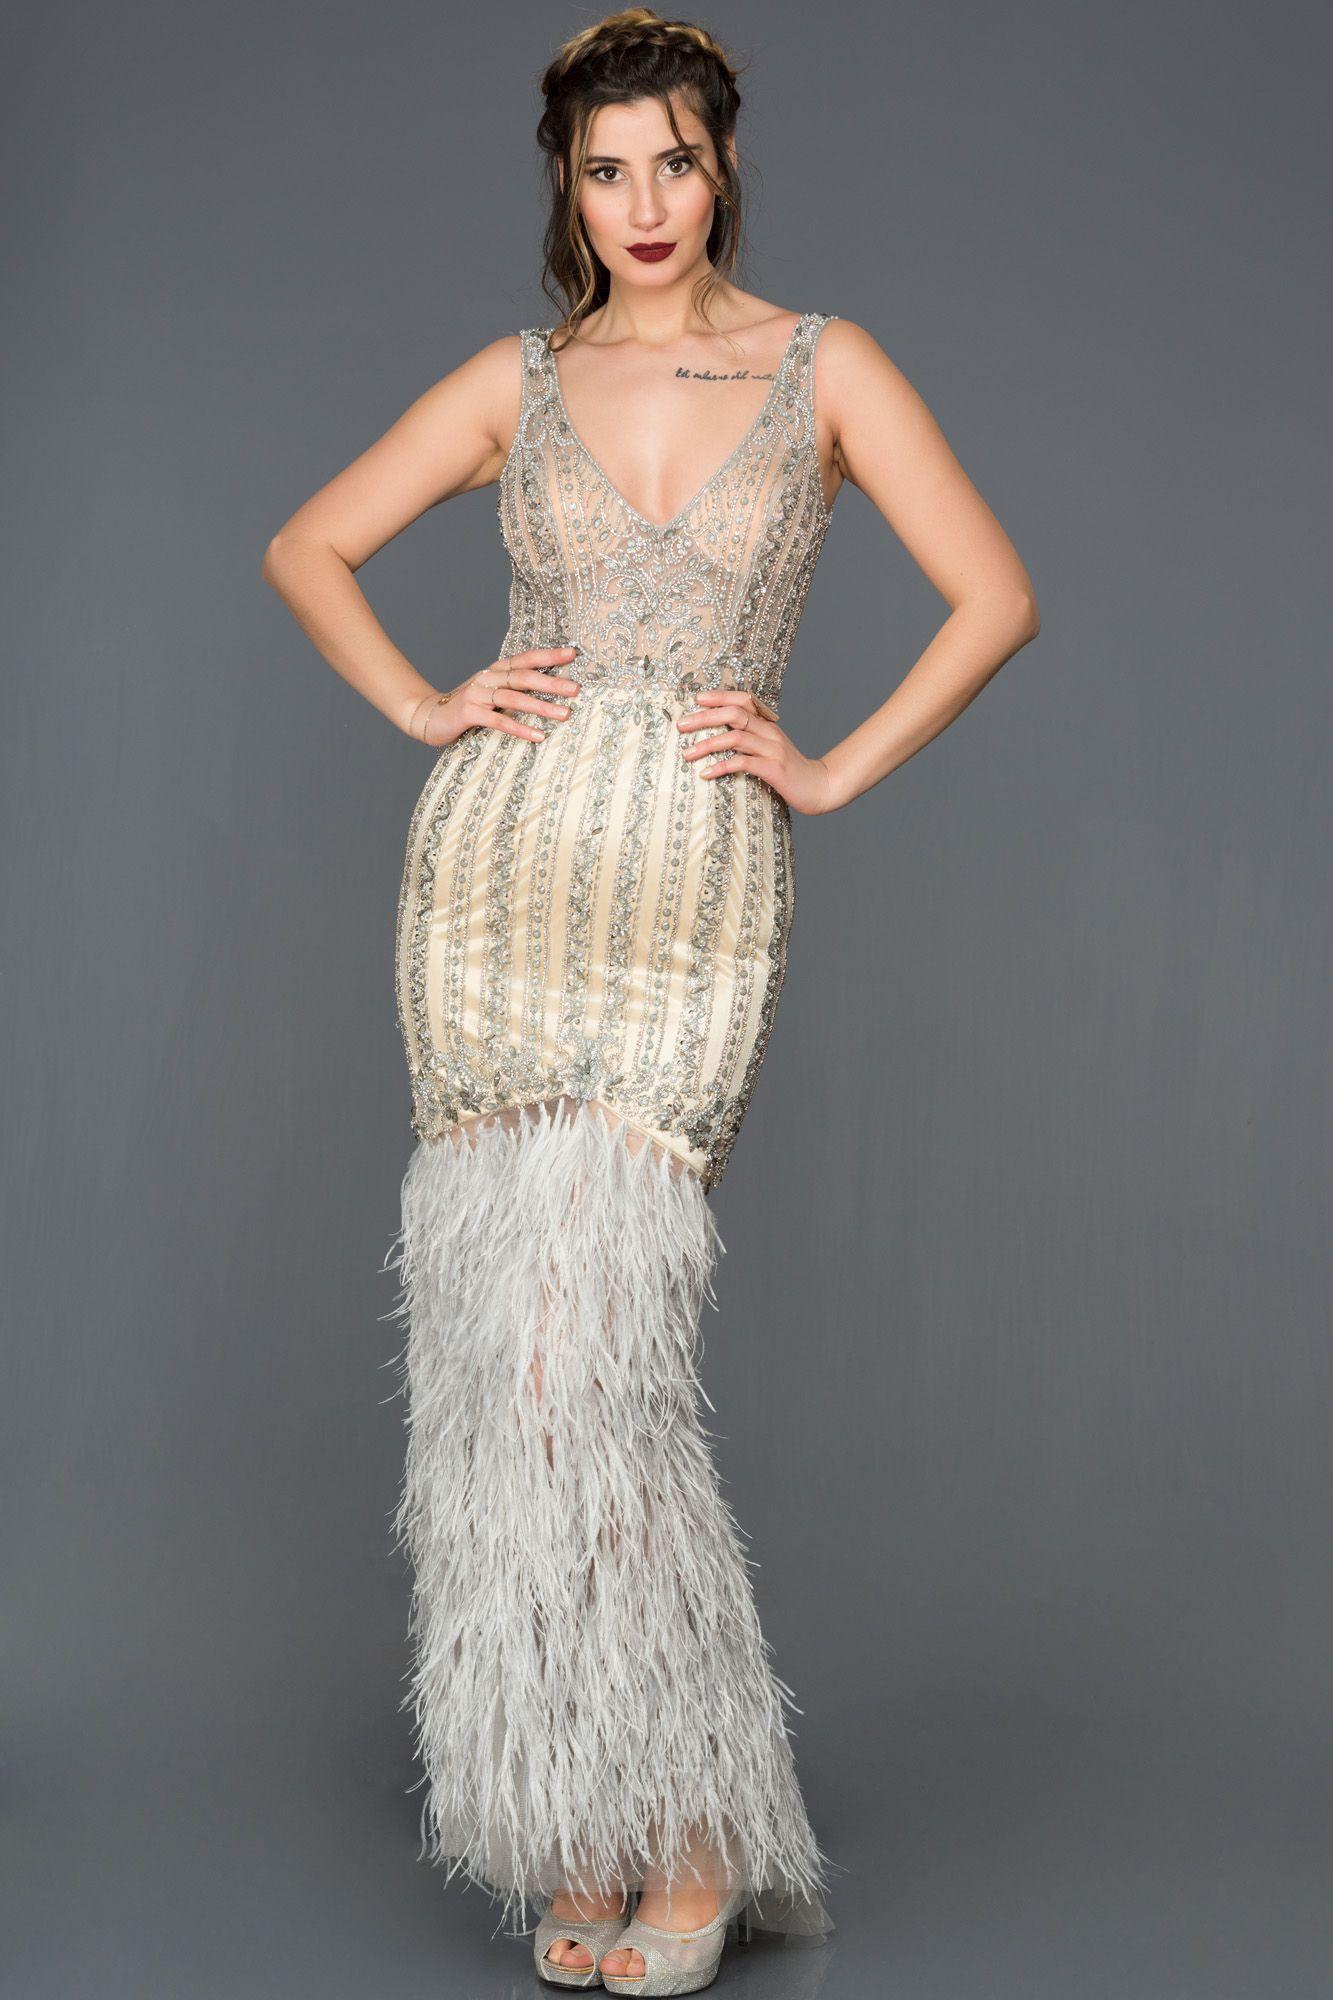 Otris Detayli Ozel Tasarim Abiye Elbise Ab77080 Elbise Resmi Elbise The Dress